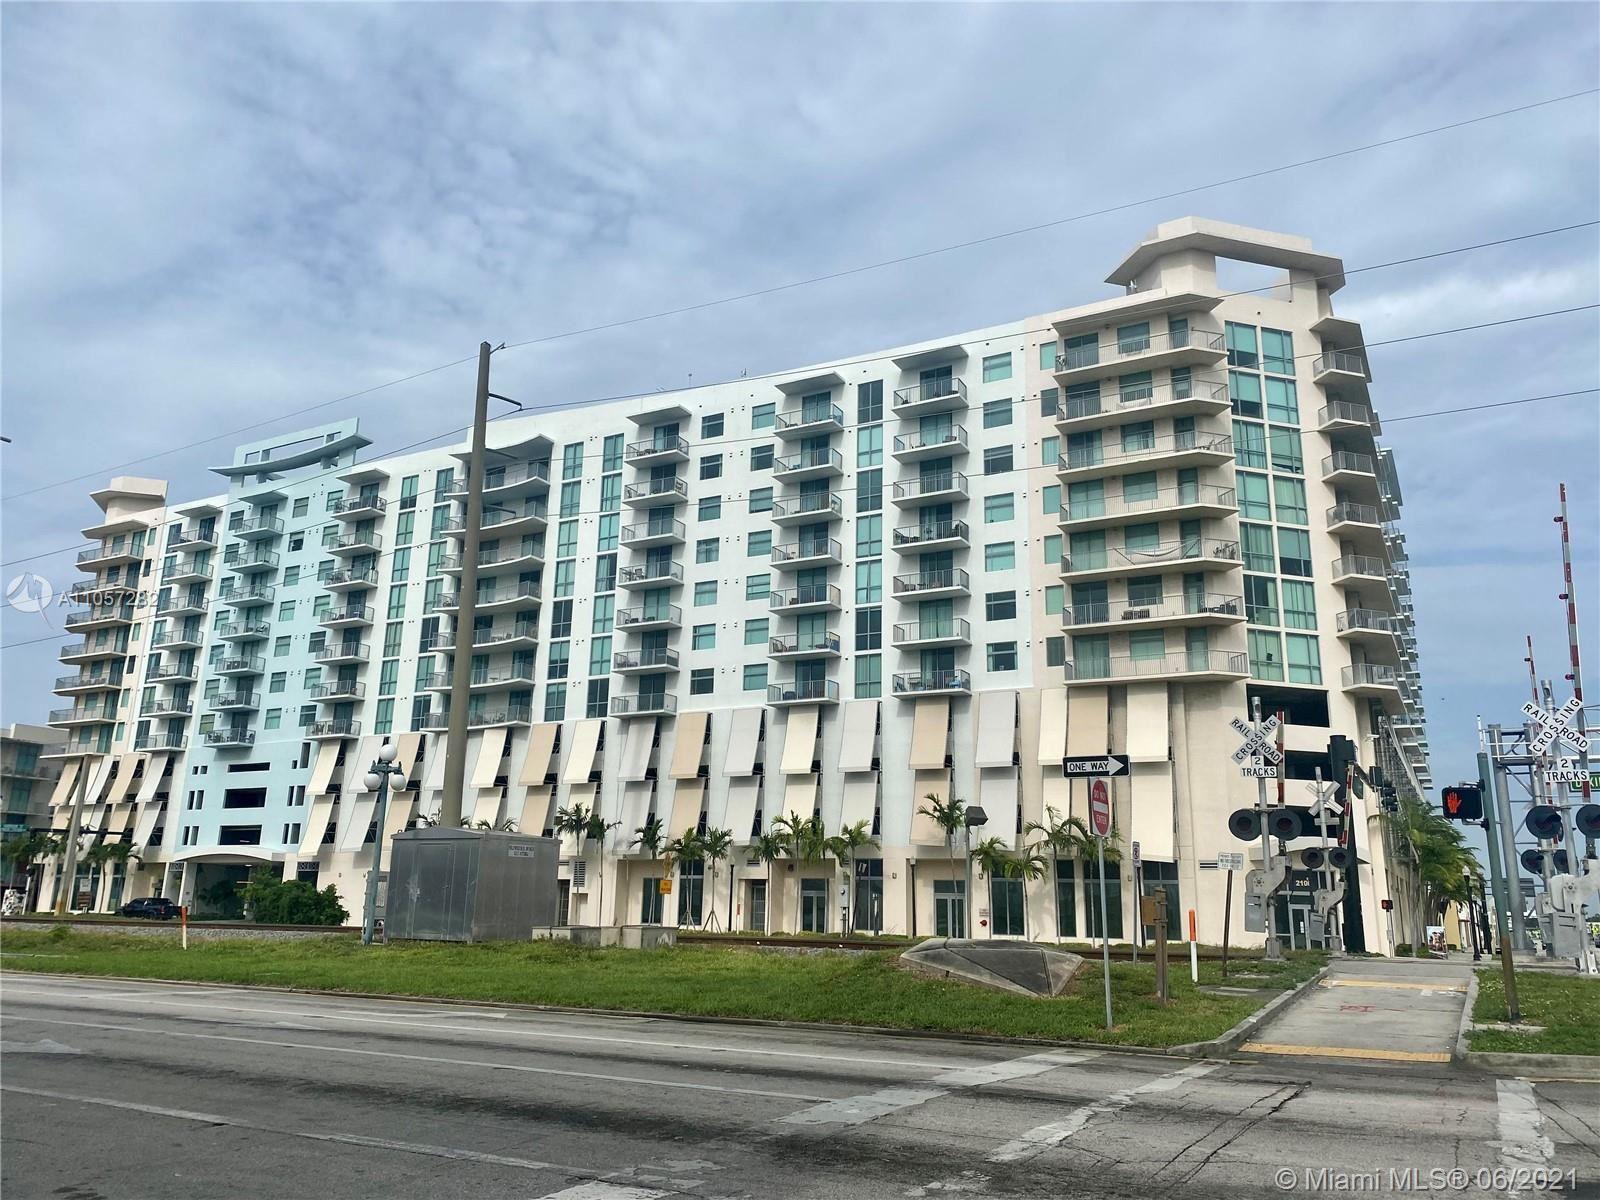 140 S Dixie Hwy #504, Hollywood, FL 33020 - #: A11057282